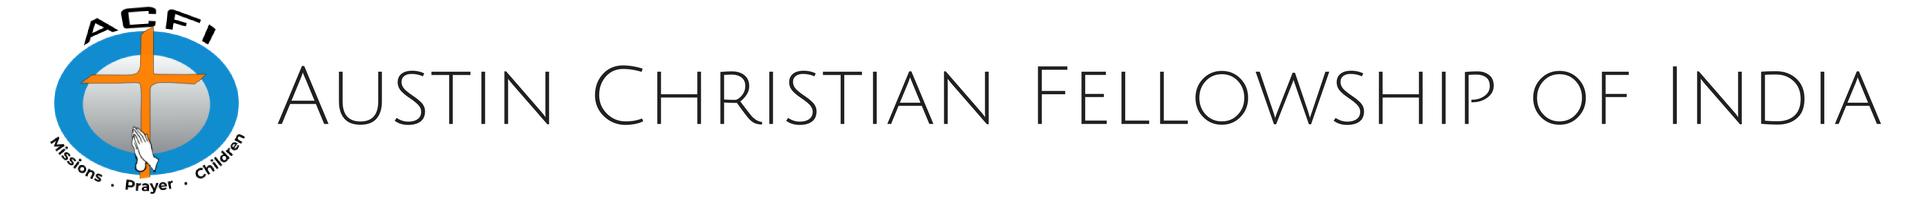 Austin Christian Fellowship Of India